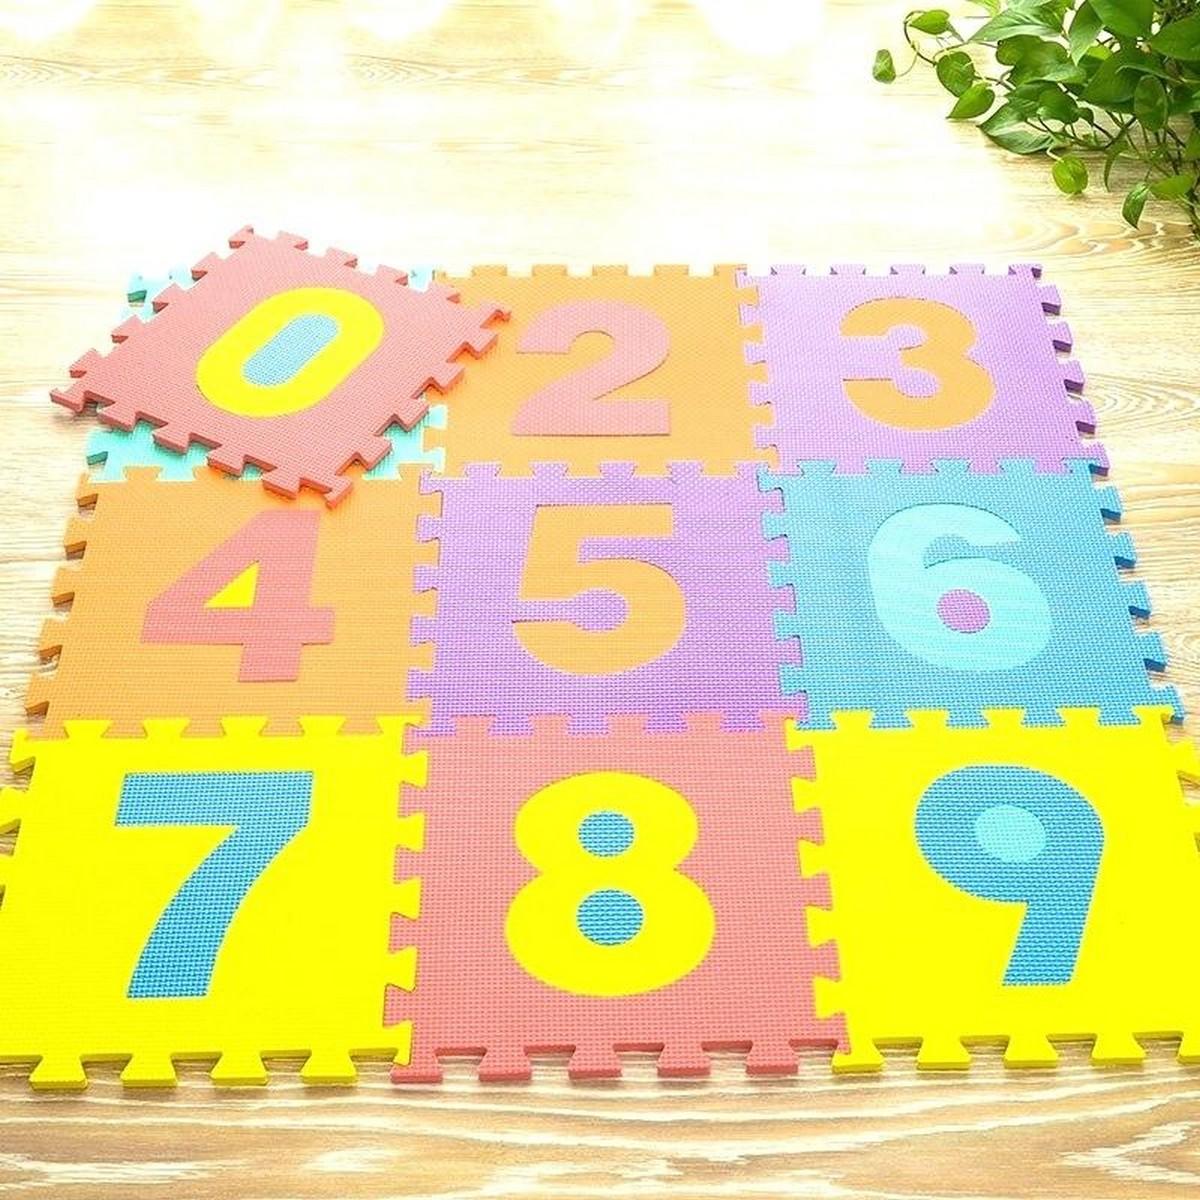 Kids Play Mat ABC Mat A to Z 26 Pieces and Number Mat 0 to 9 10 Pieces Foam Floor Mat 1ft x 1ft